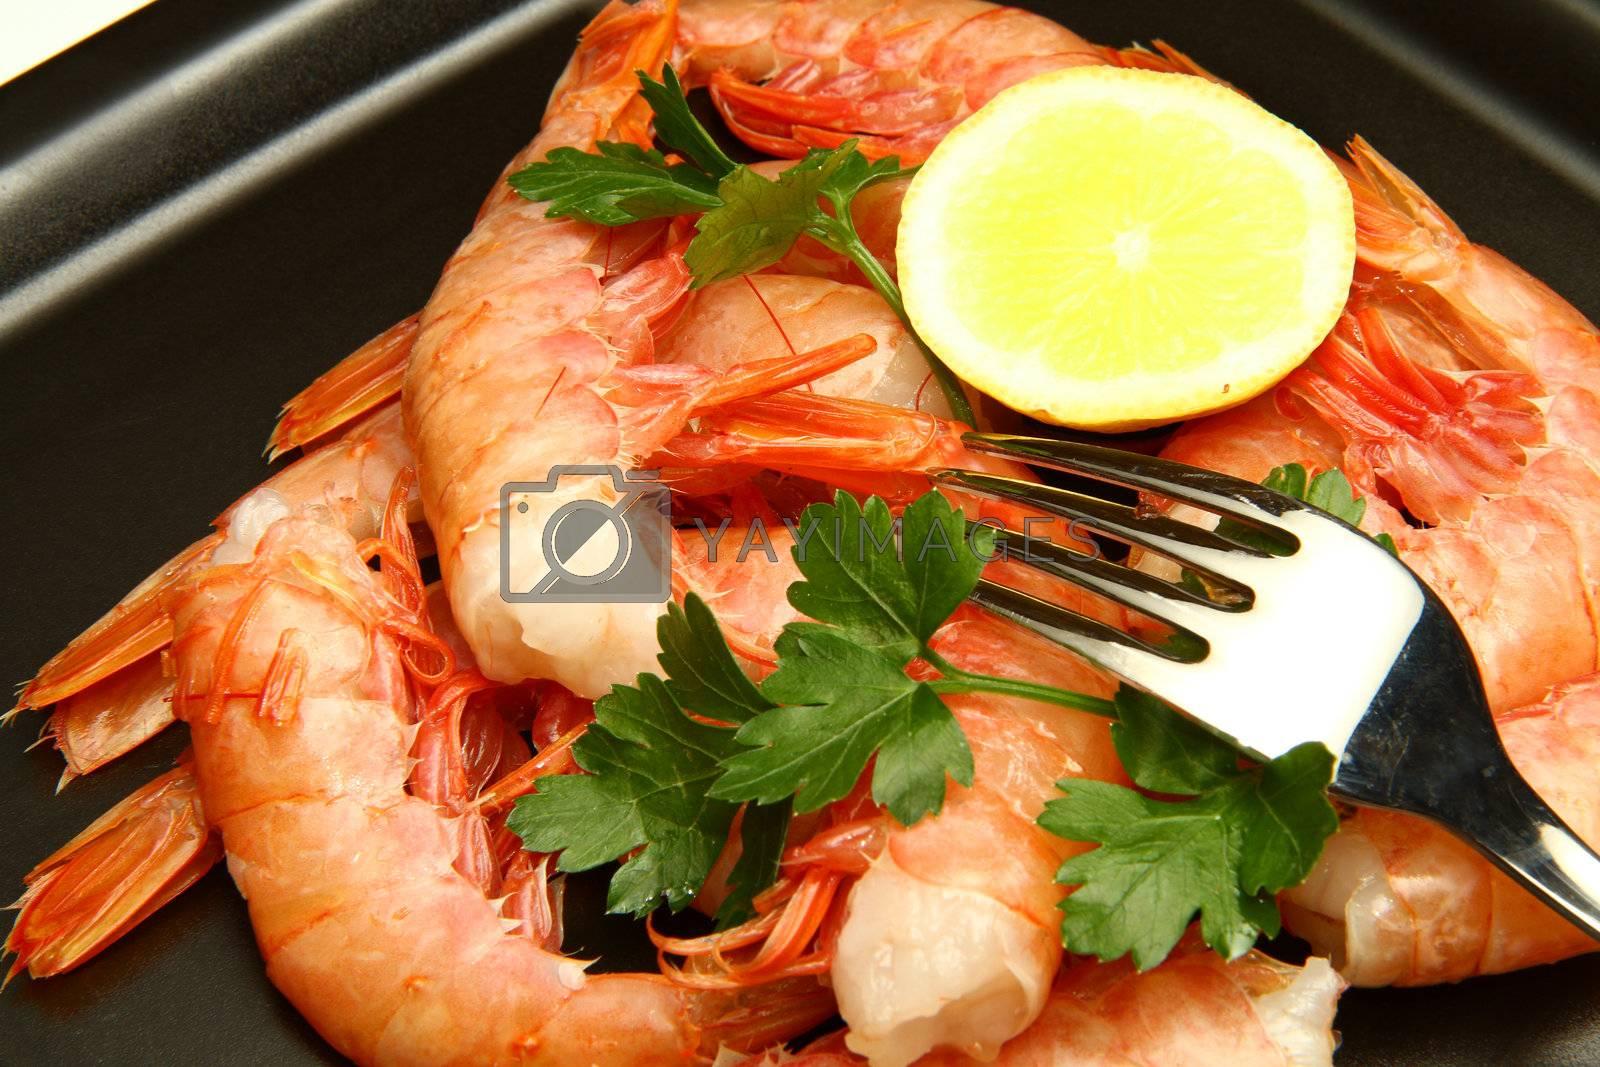 fresh shrimp salad with parsley and lemon